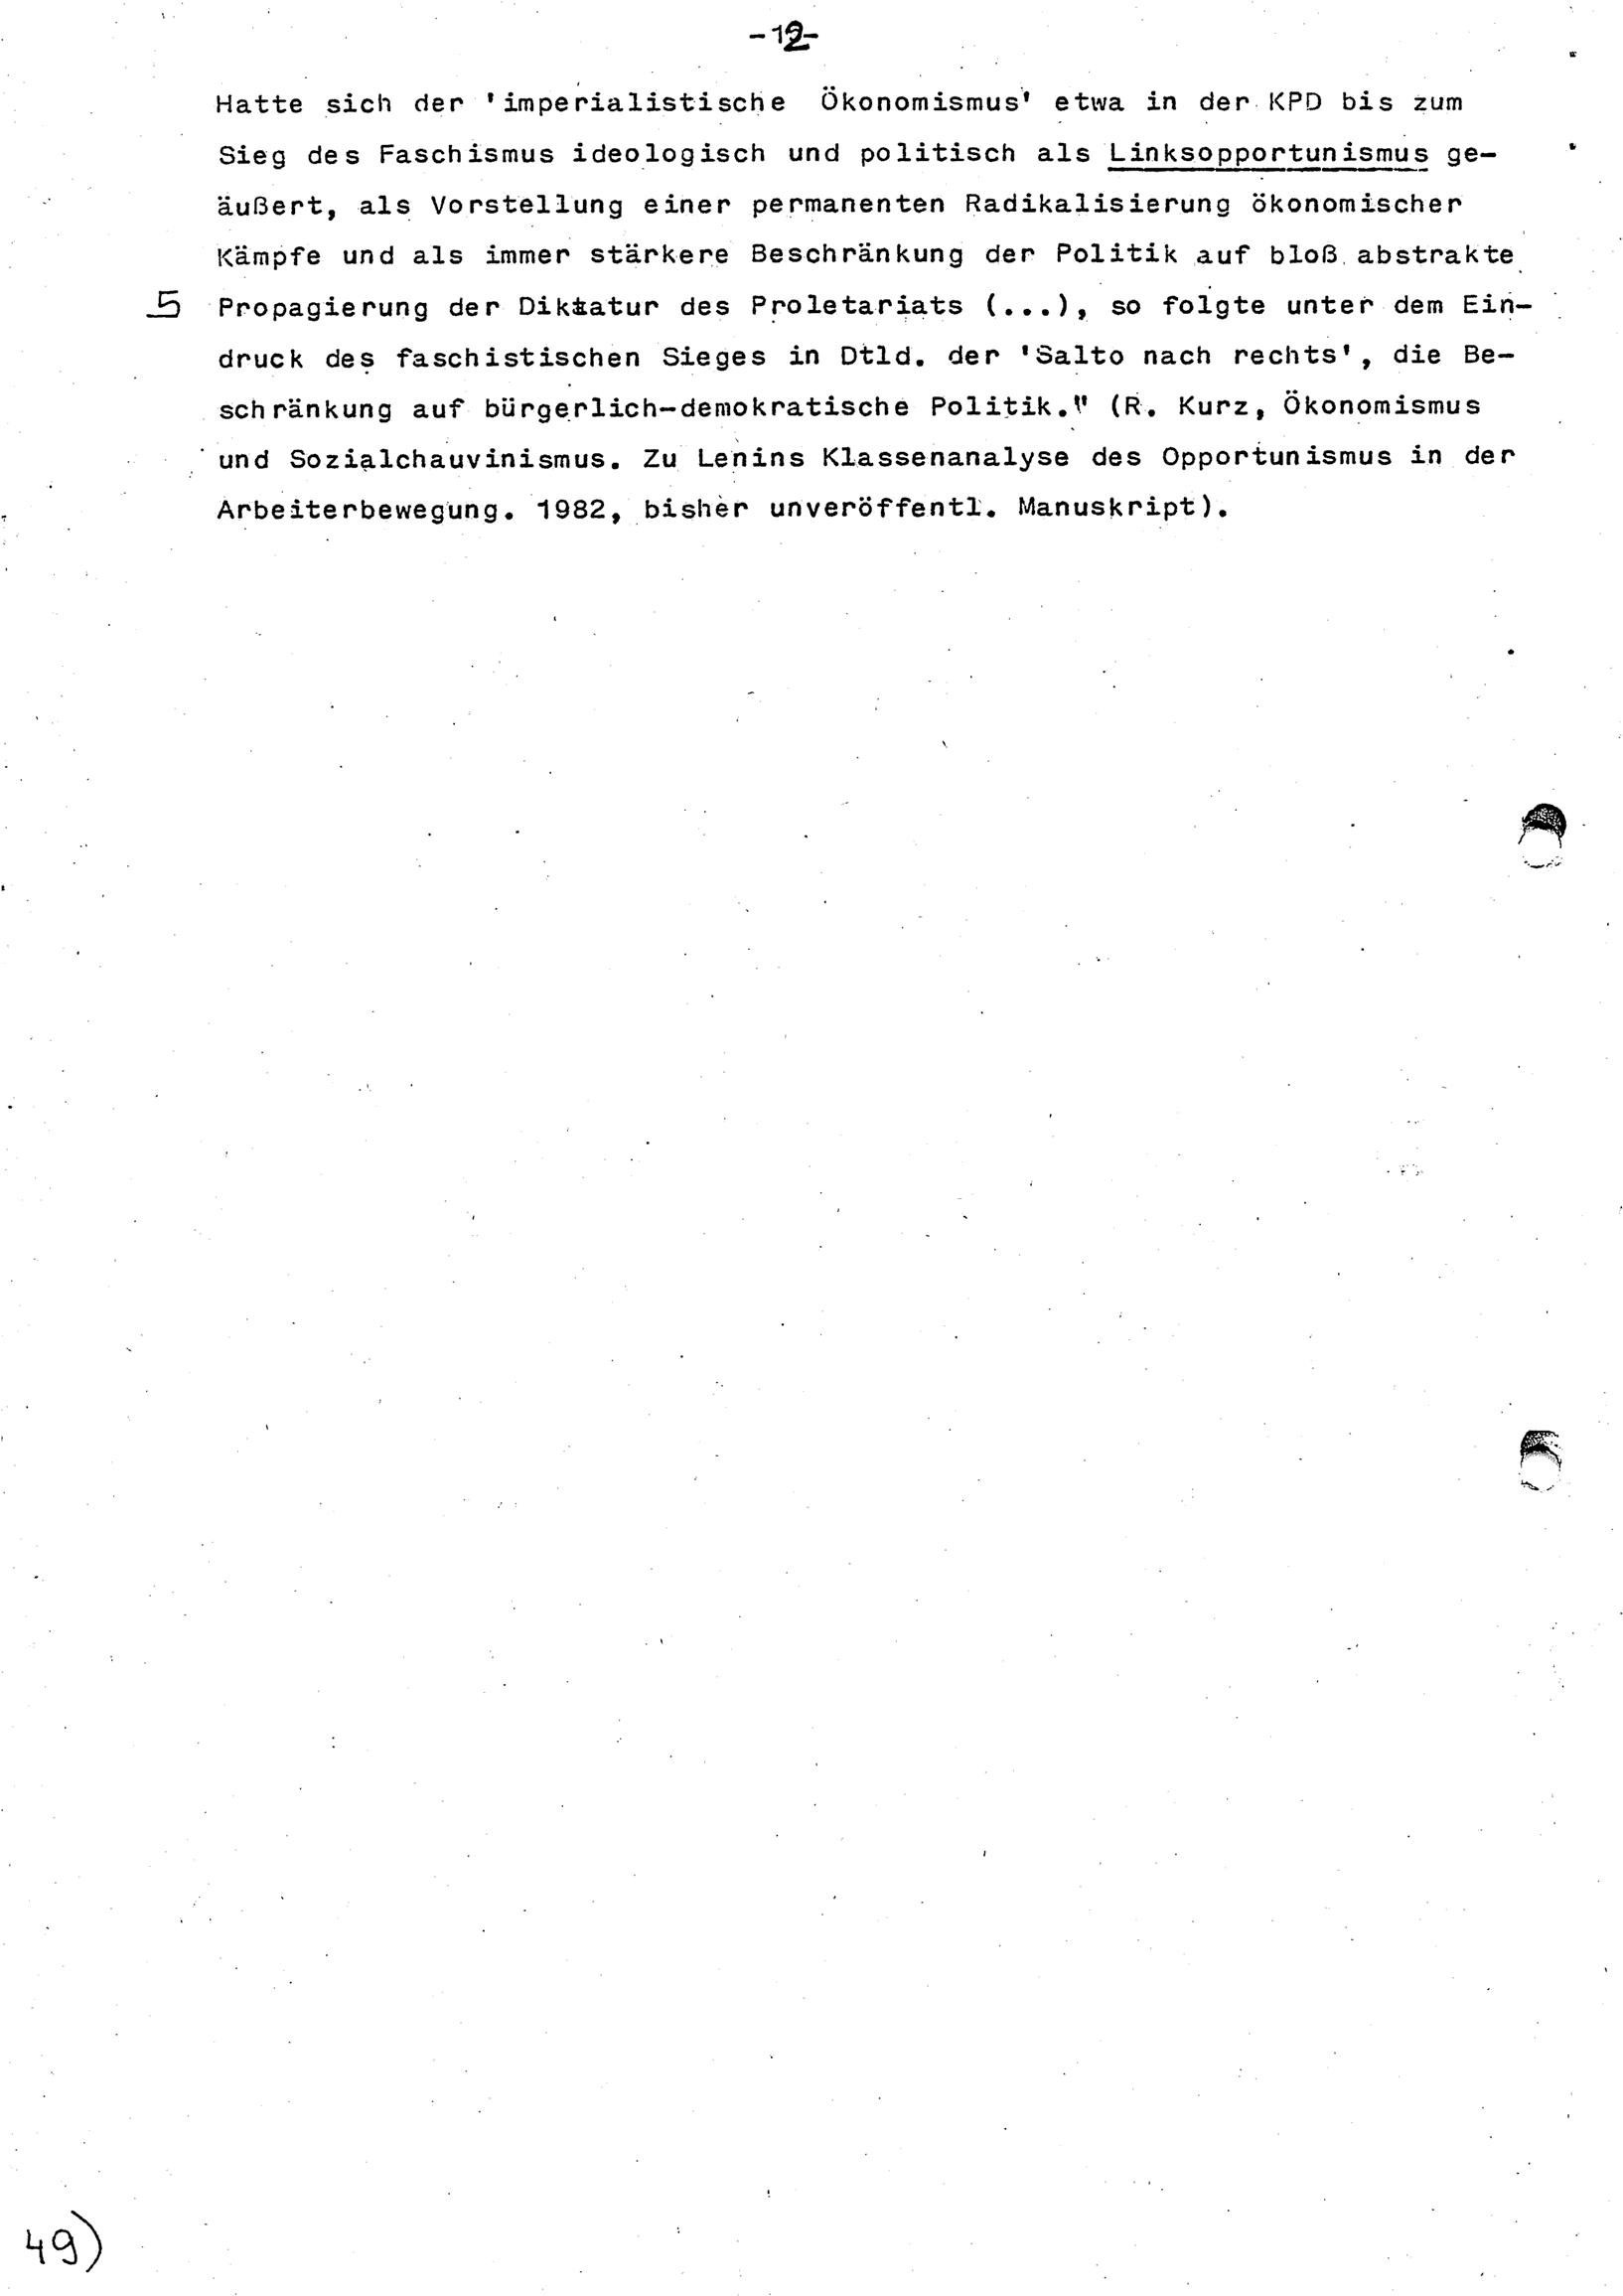 Ulm_KGU_Arbeitsheft_19830425_015_052